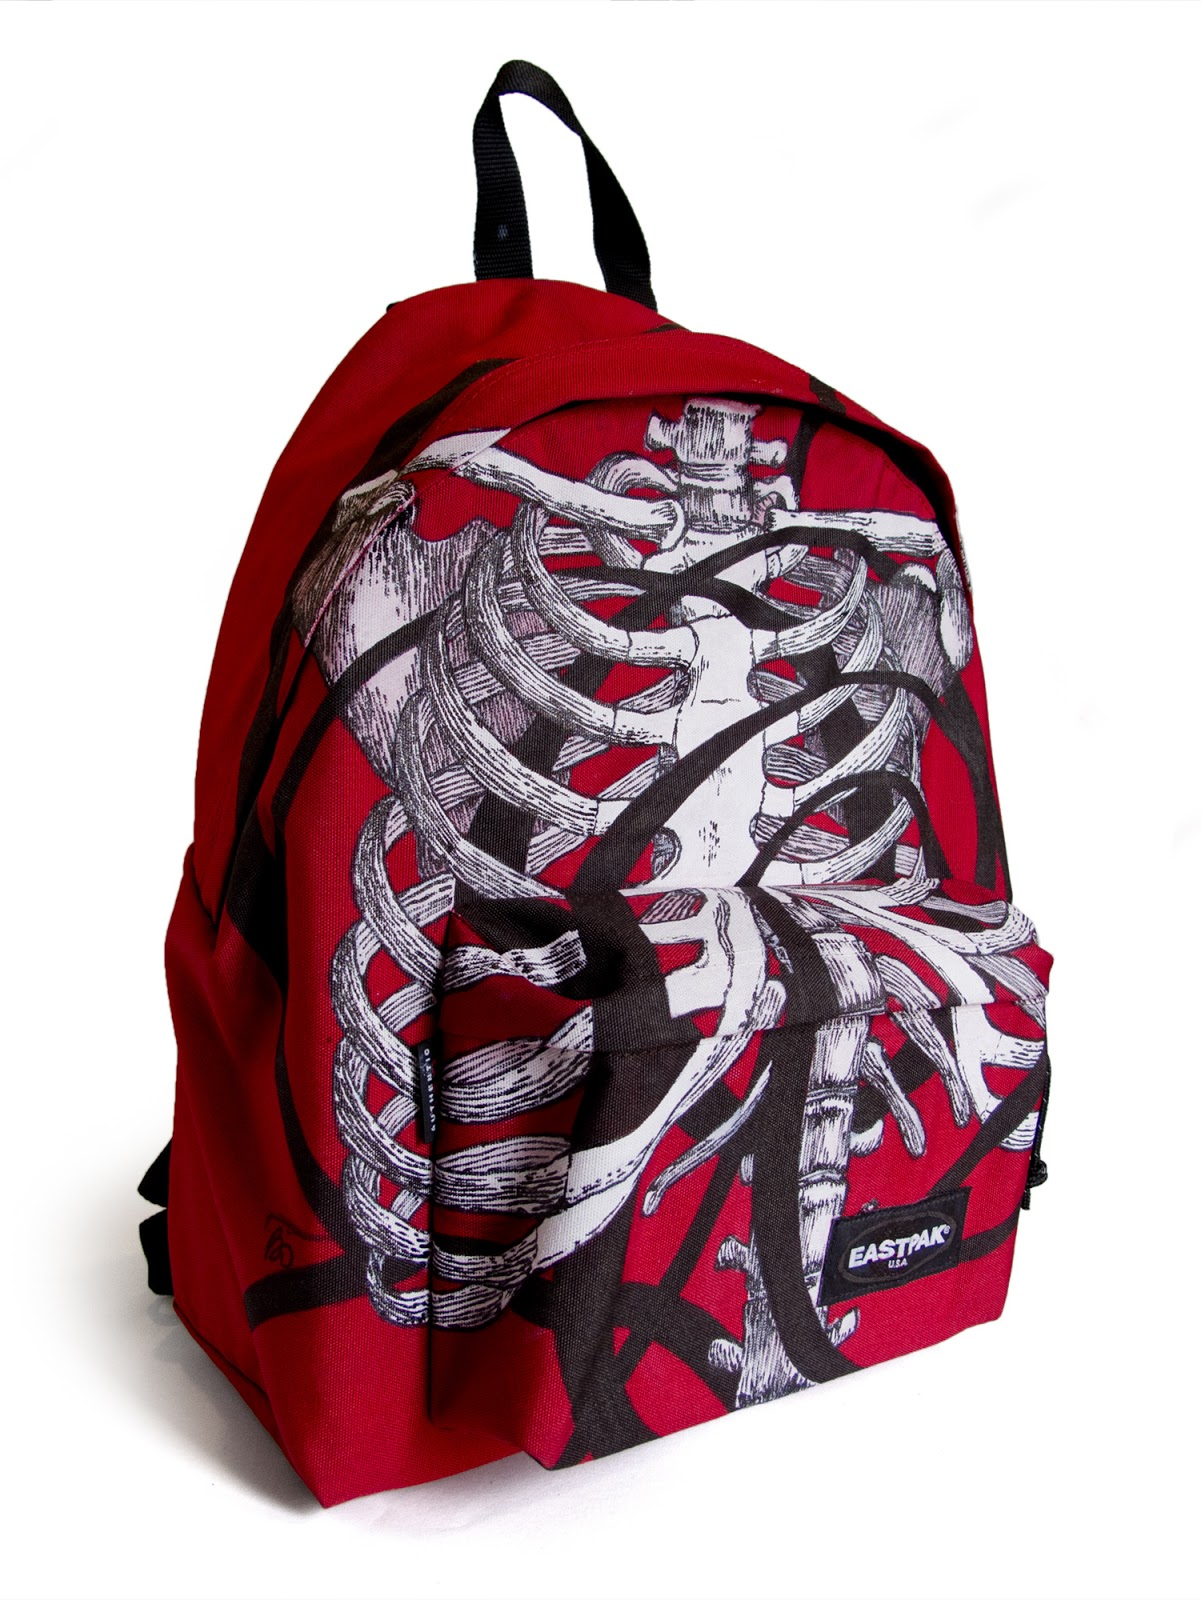 Arnobio art dessin sur un sac eastpak design on a eastpak bag - Dessin sur sac eastpak ...